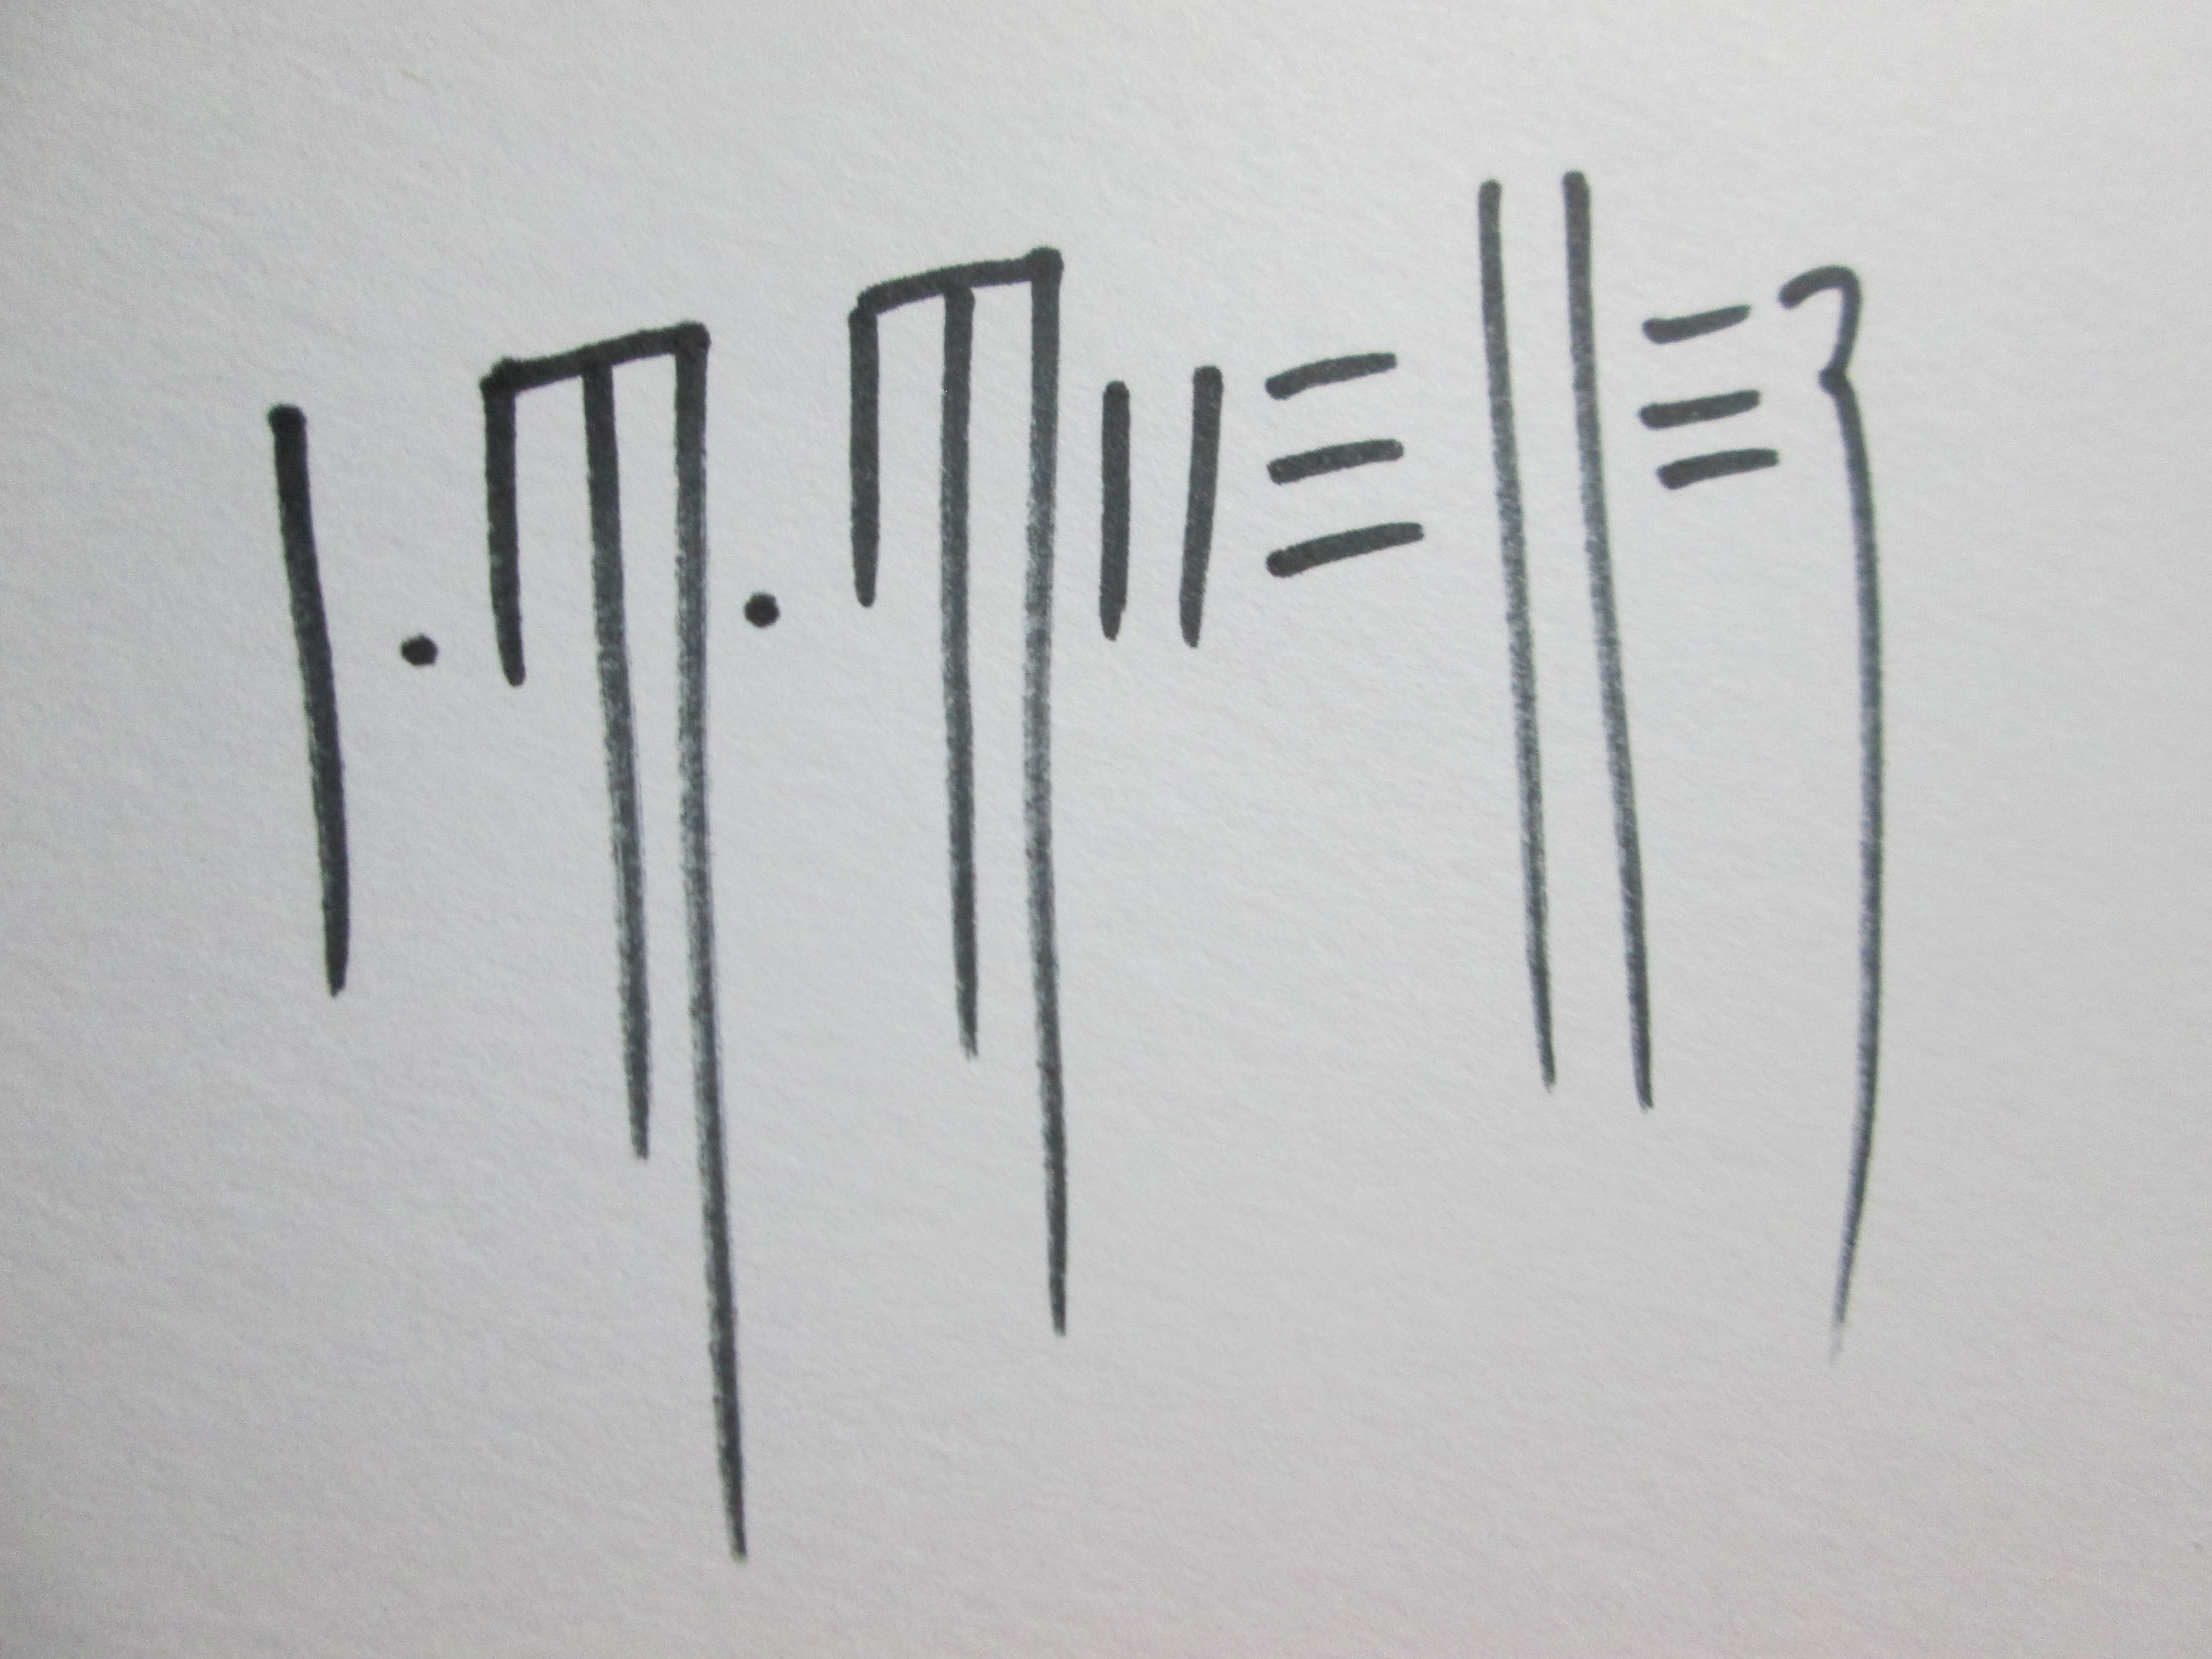 Iracema Marianne Mueller Signature